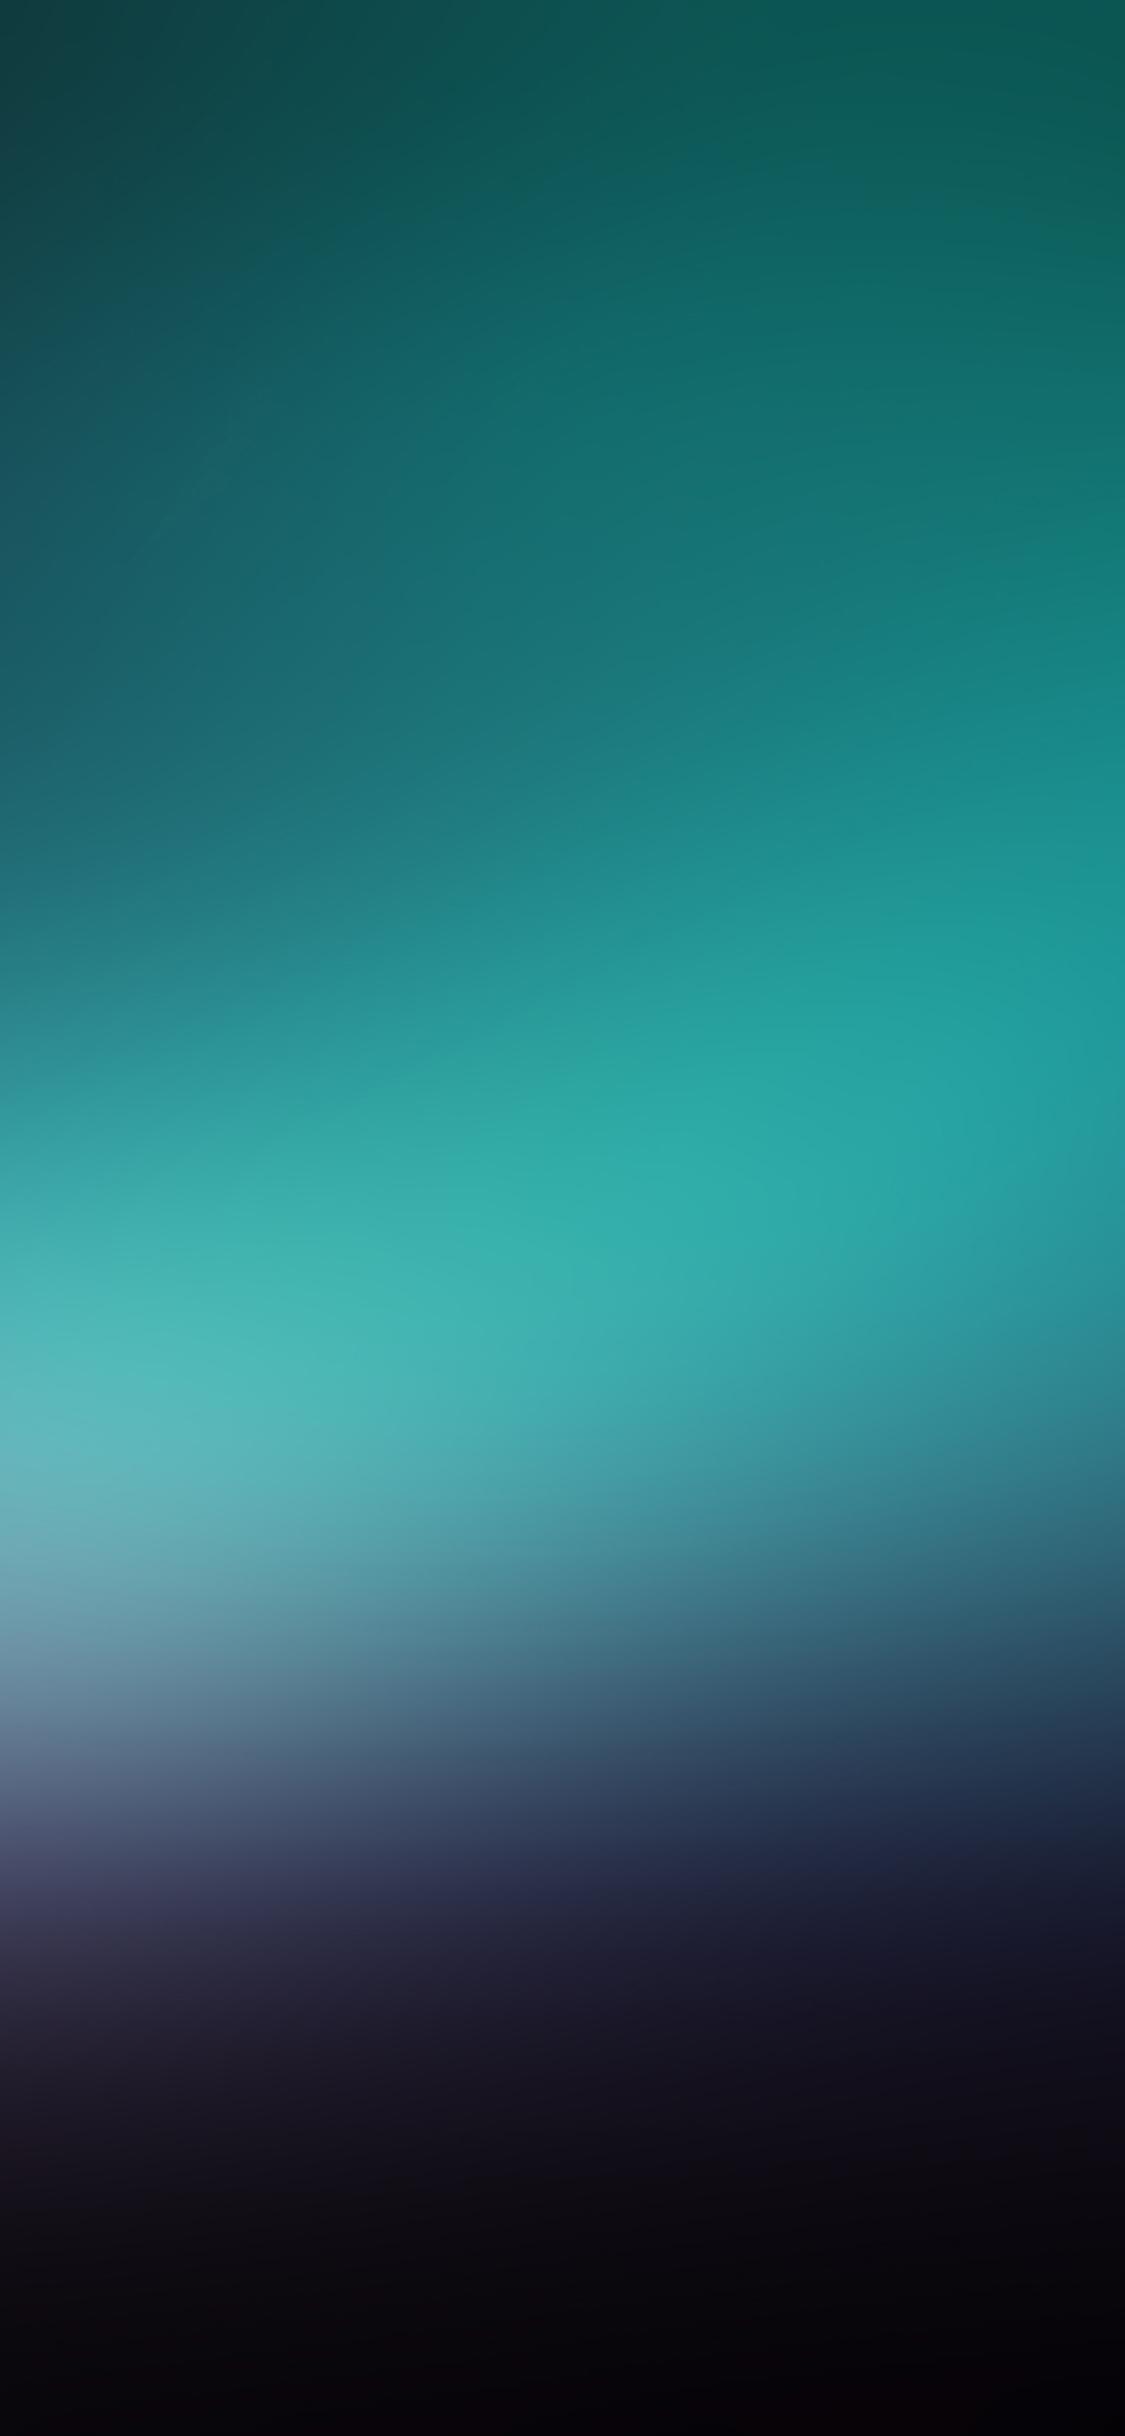 iPhoneXpapers.com-Apple-iPhone-wallpaper-sa80-wallpaper-space-green-blur